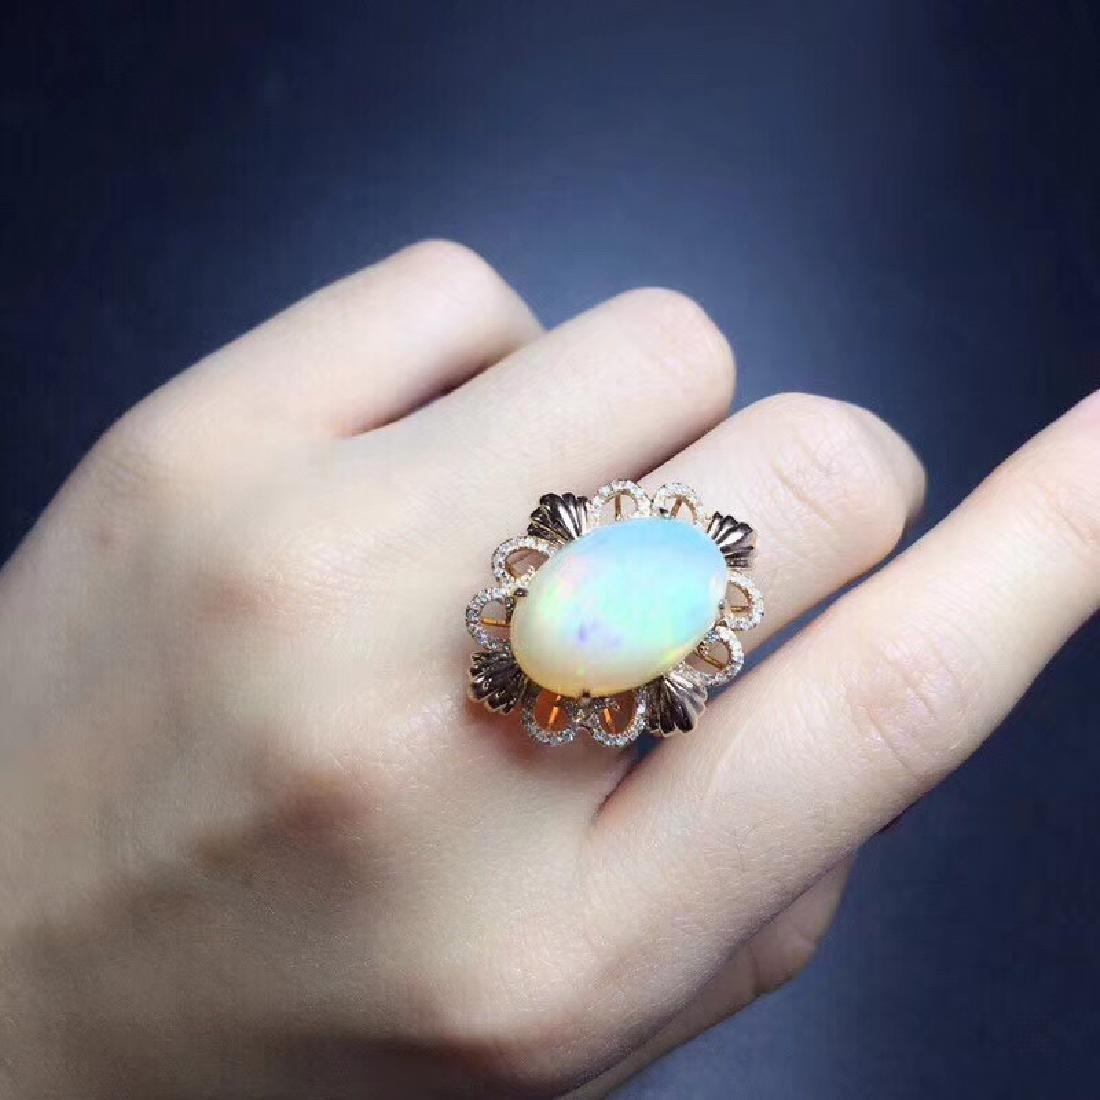 7.7 CTW Opal & VS Diamond Ring 18K - 6